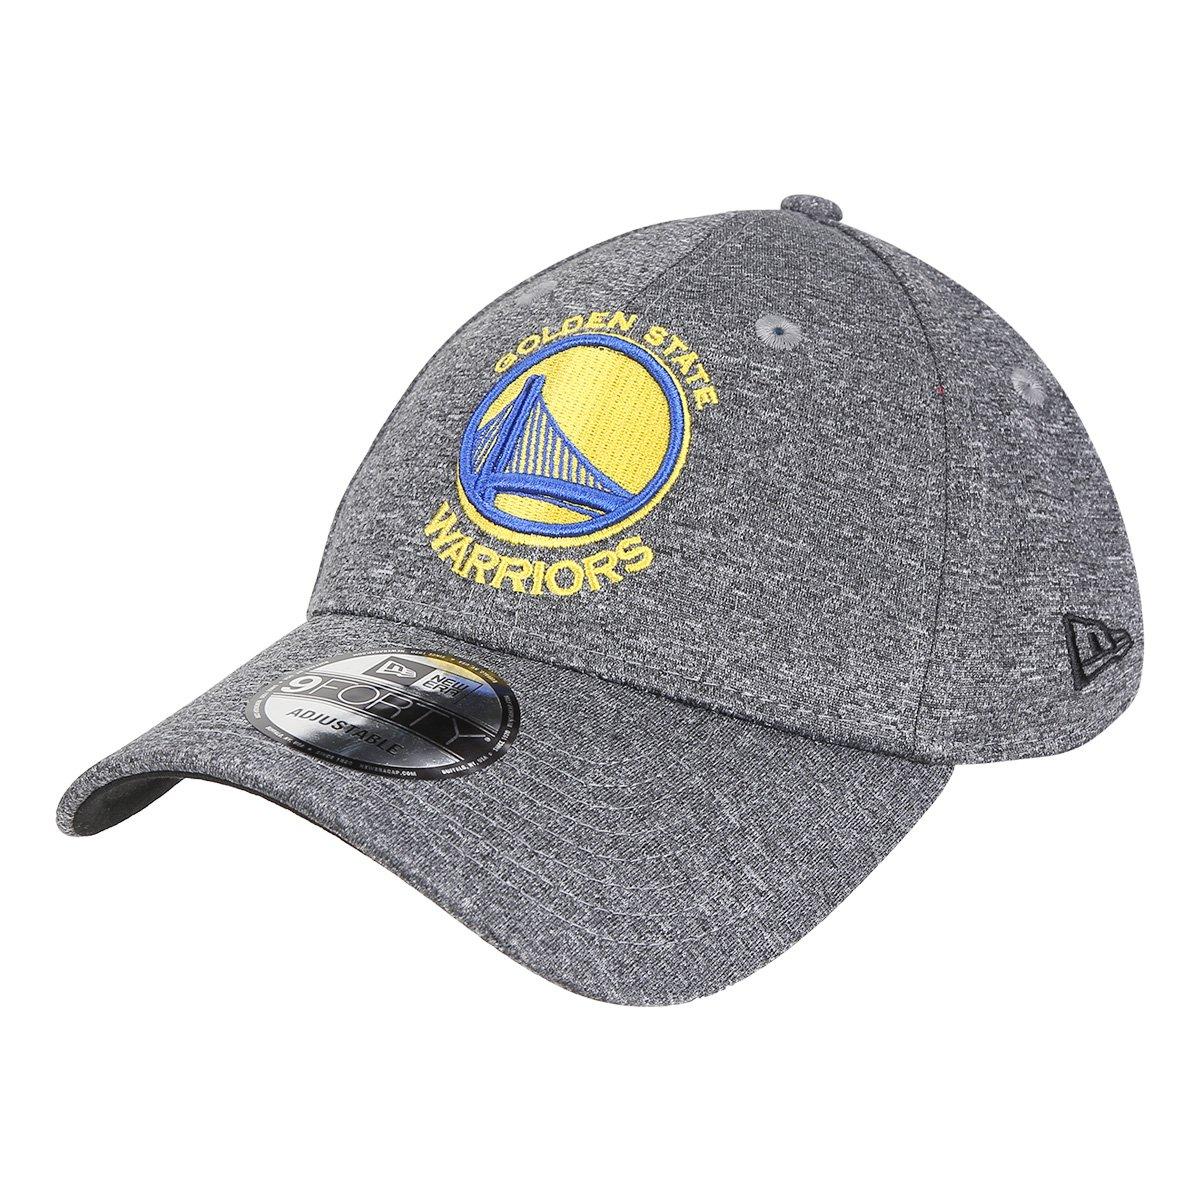 Boné New Era NBA Golden State Warriors St Core Aba Curva d20c3813e67